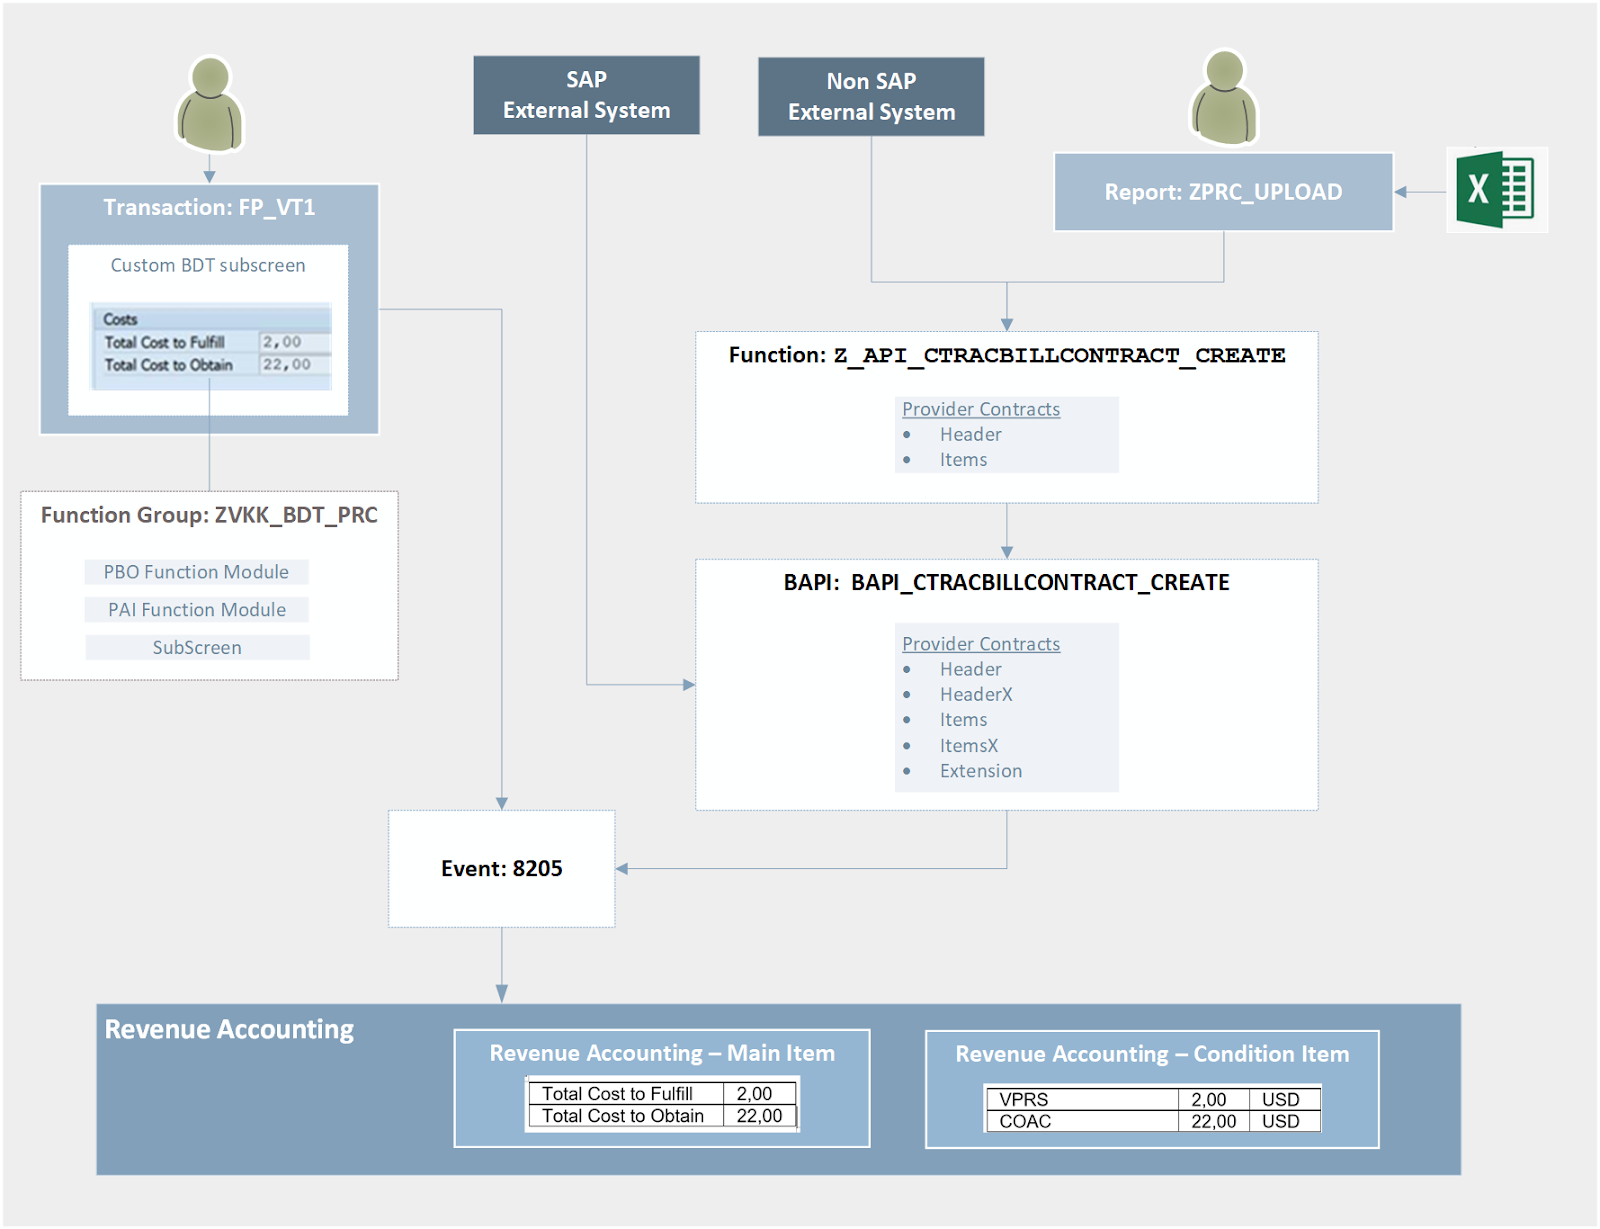 SAP ABAP Central: Custom Data from FI-CA to RAR (Part I